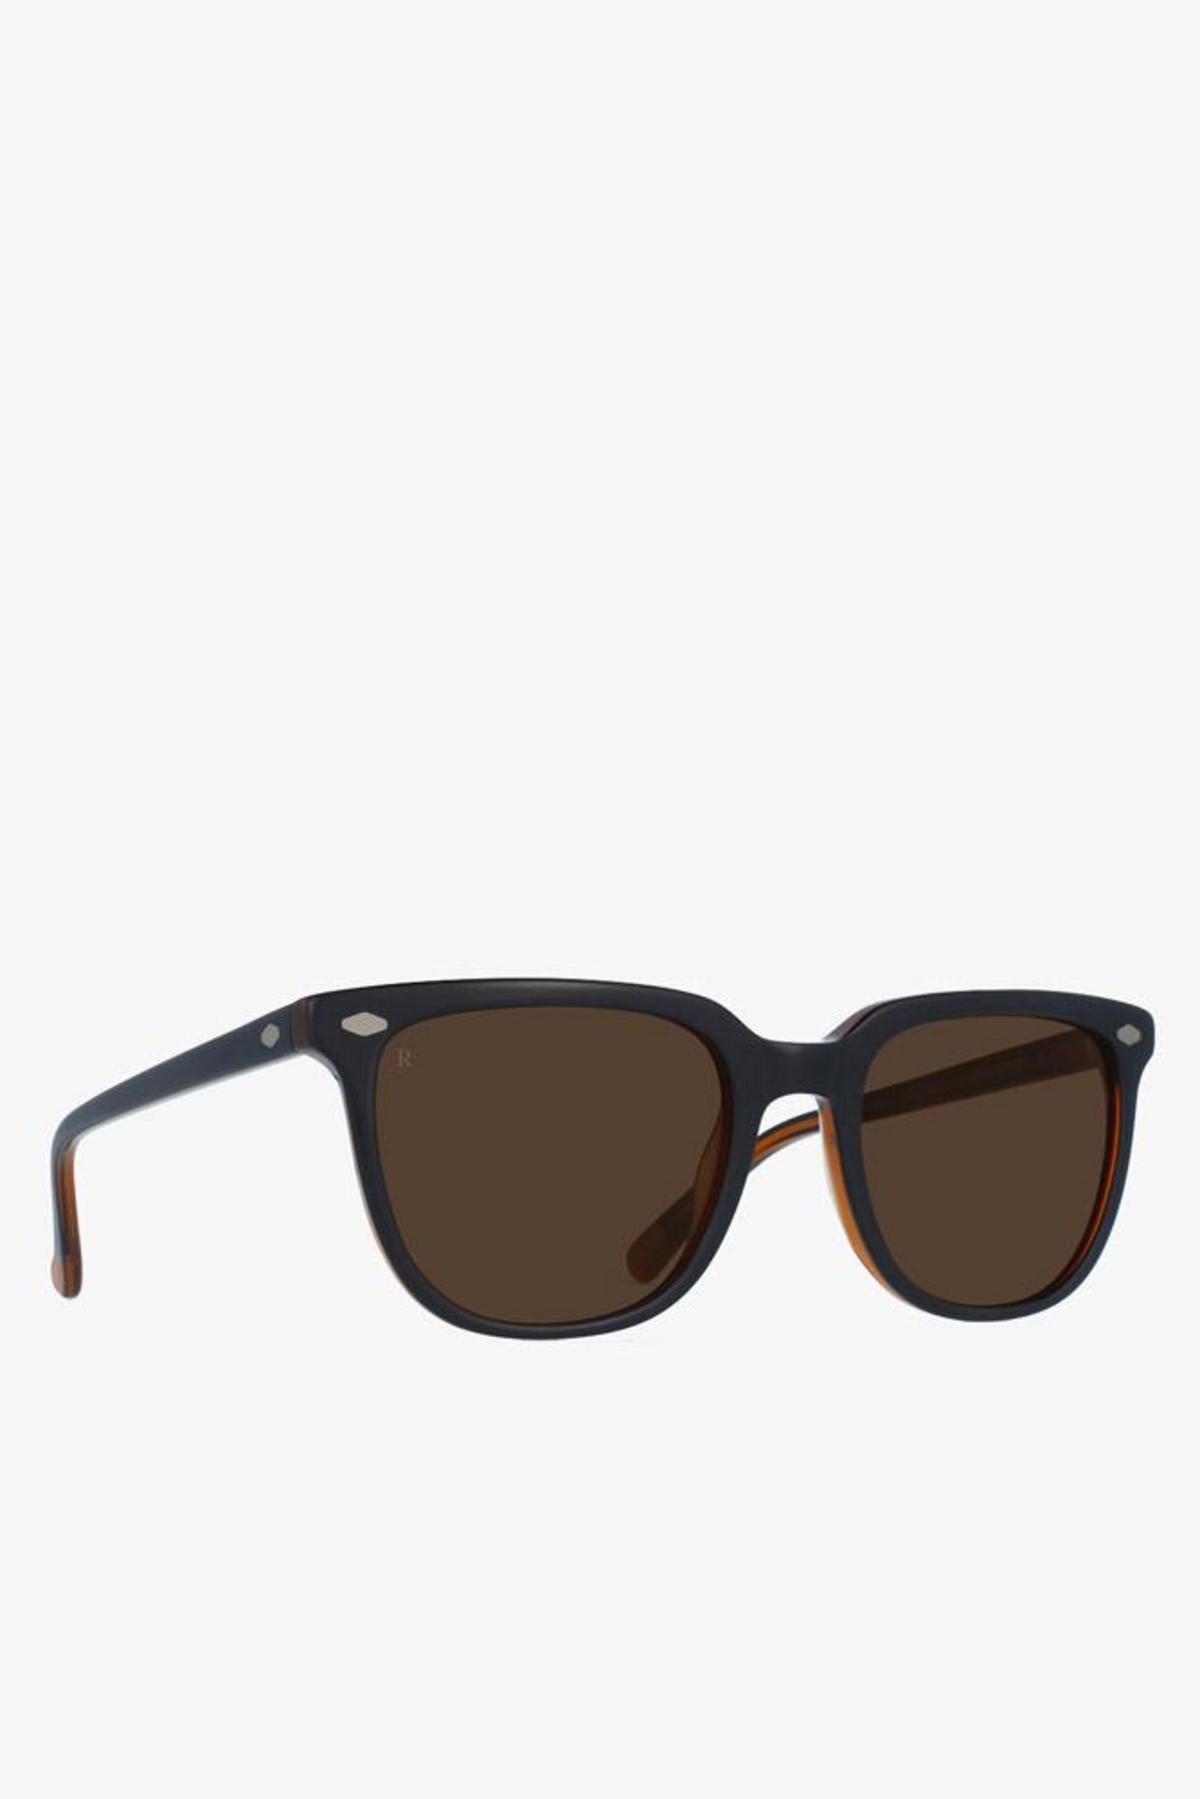 e78a8e3c298d Raen Optics Arlo Sunglasses in Black Tan